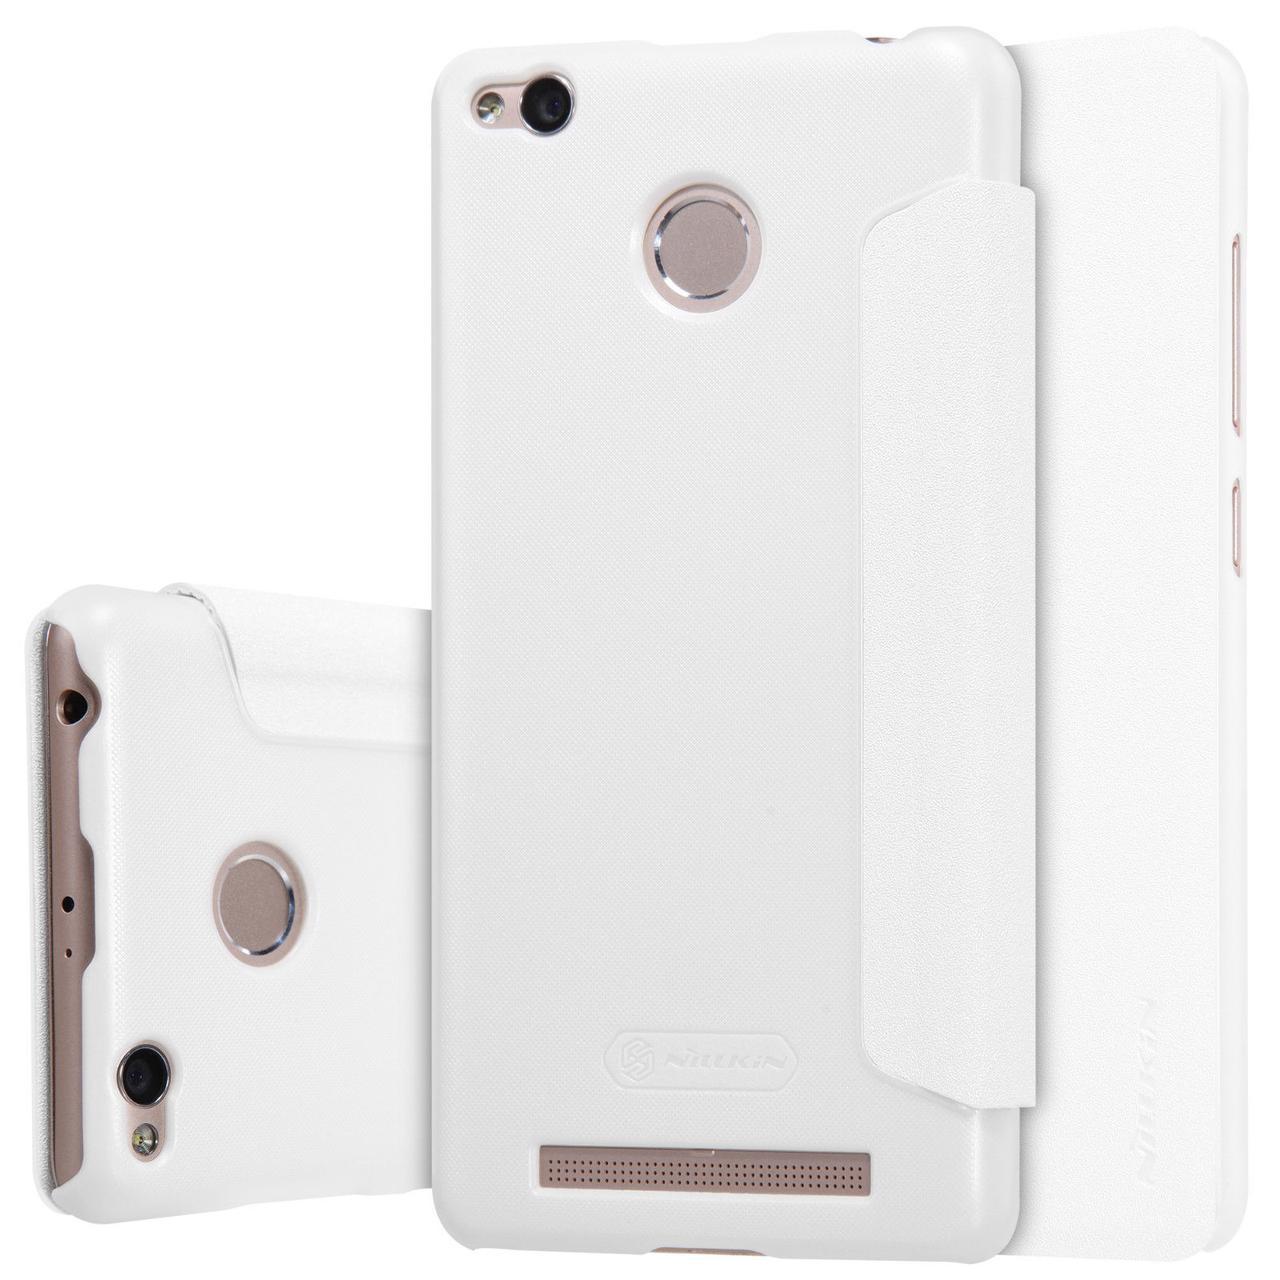 Кожаный чехол (книжка) Nillkin Sparkle Series для Xiaomi Redmi 3 Pro / Redmi 3s